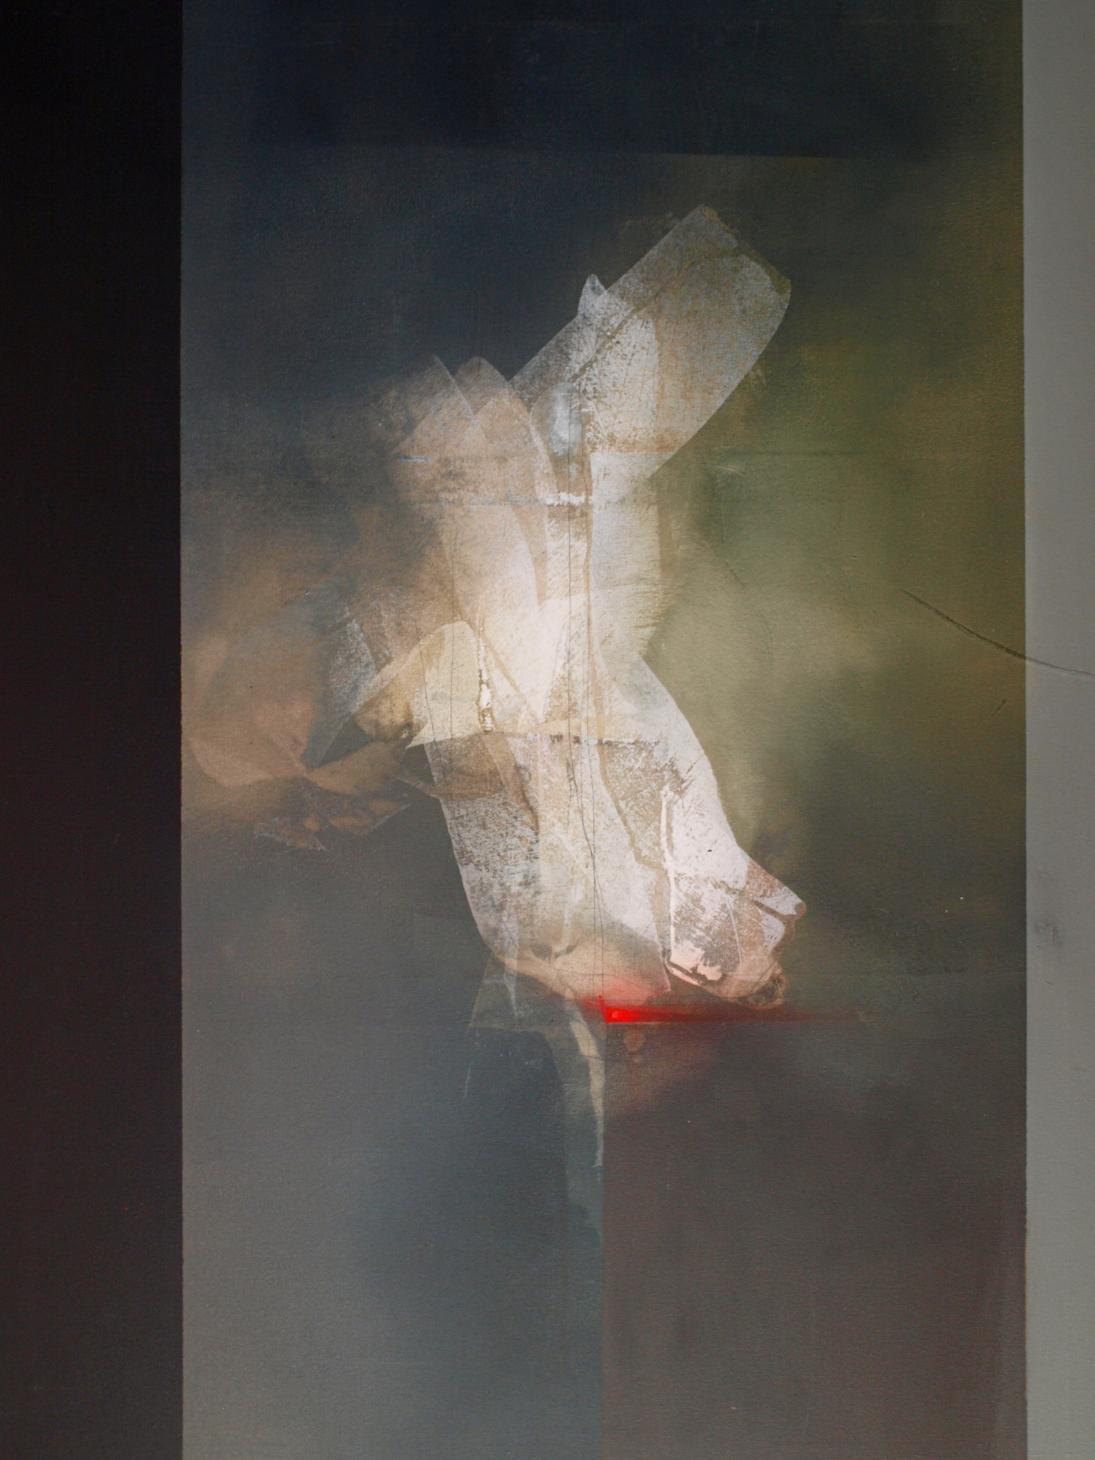 SELGEIST (2012) - Nacho Mur Zubillaga